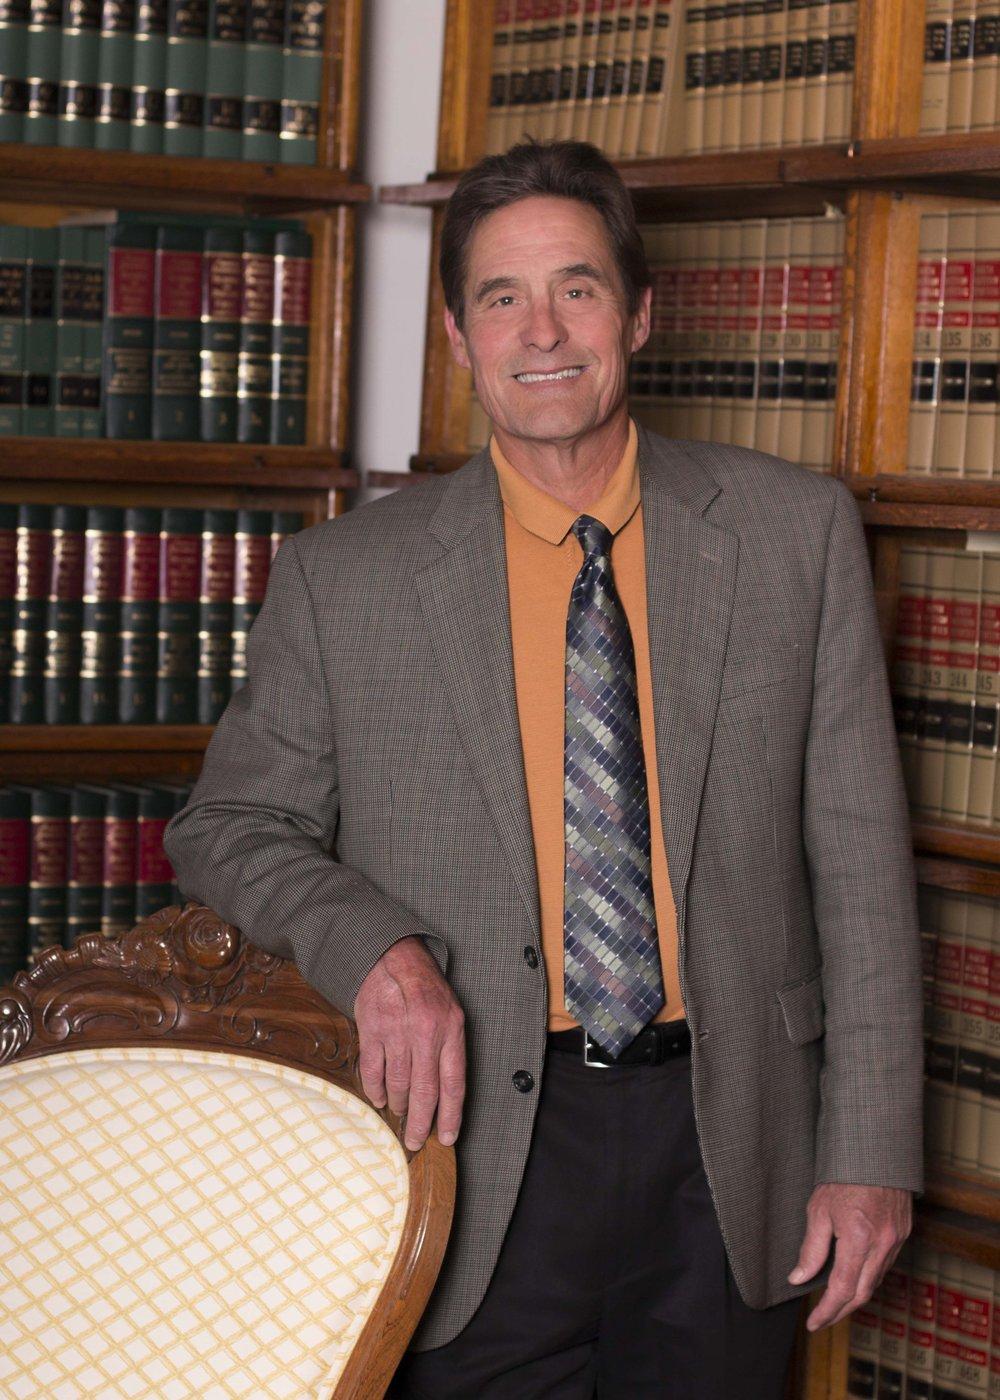 Mark D. Swanson, J.D.